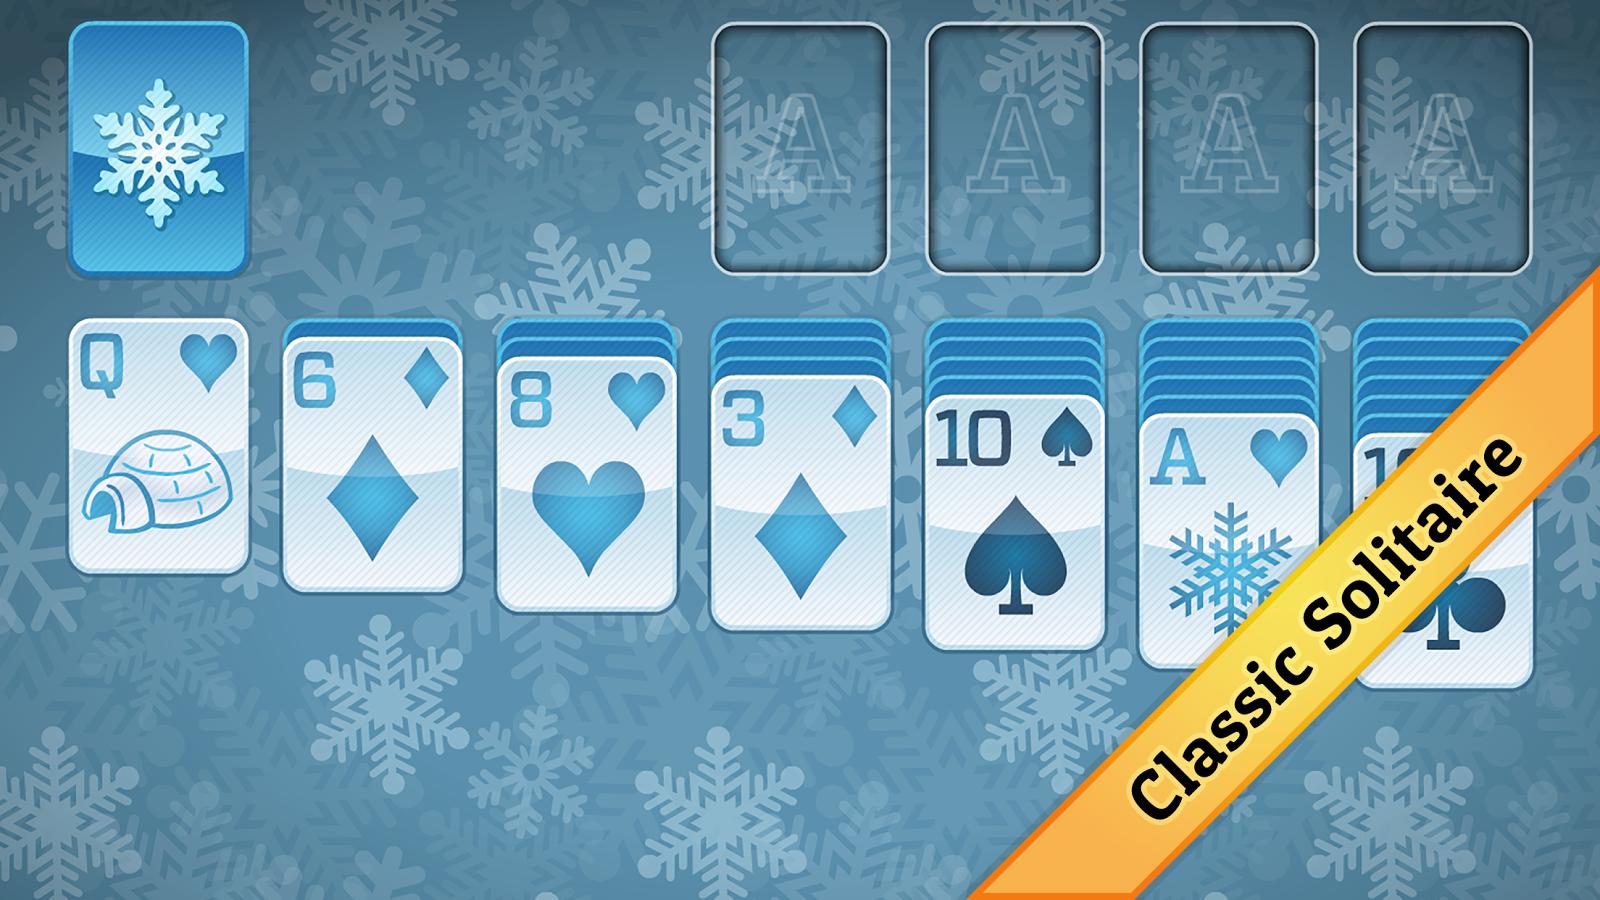 3 card klondike solitaire winter